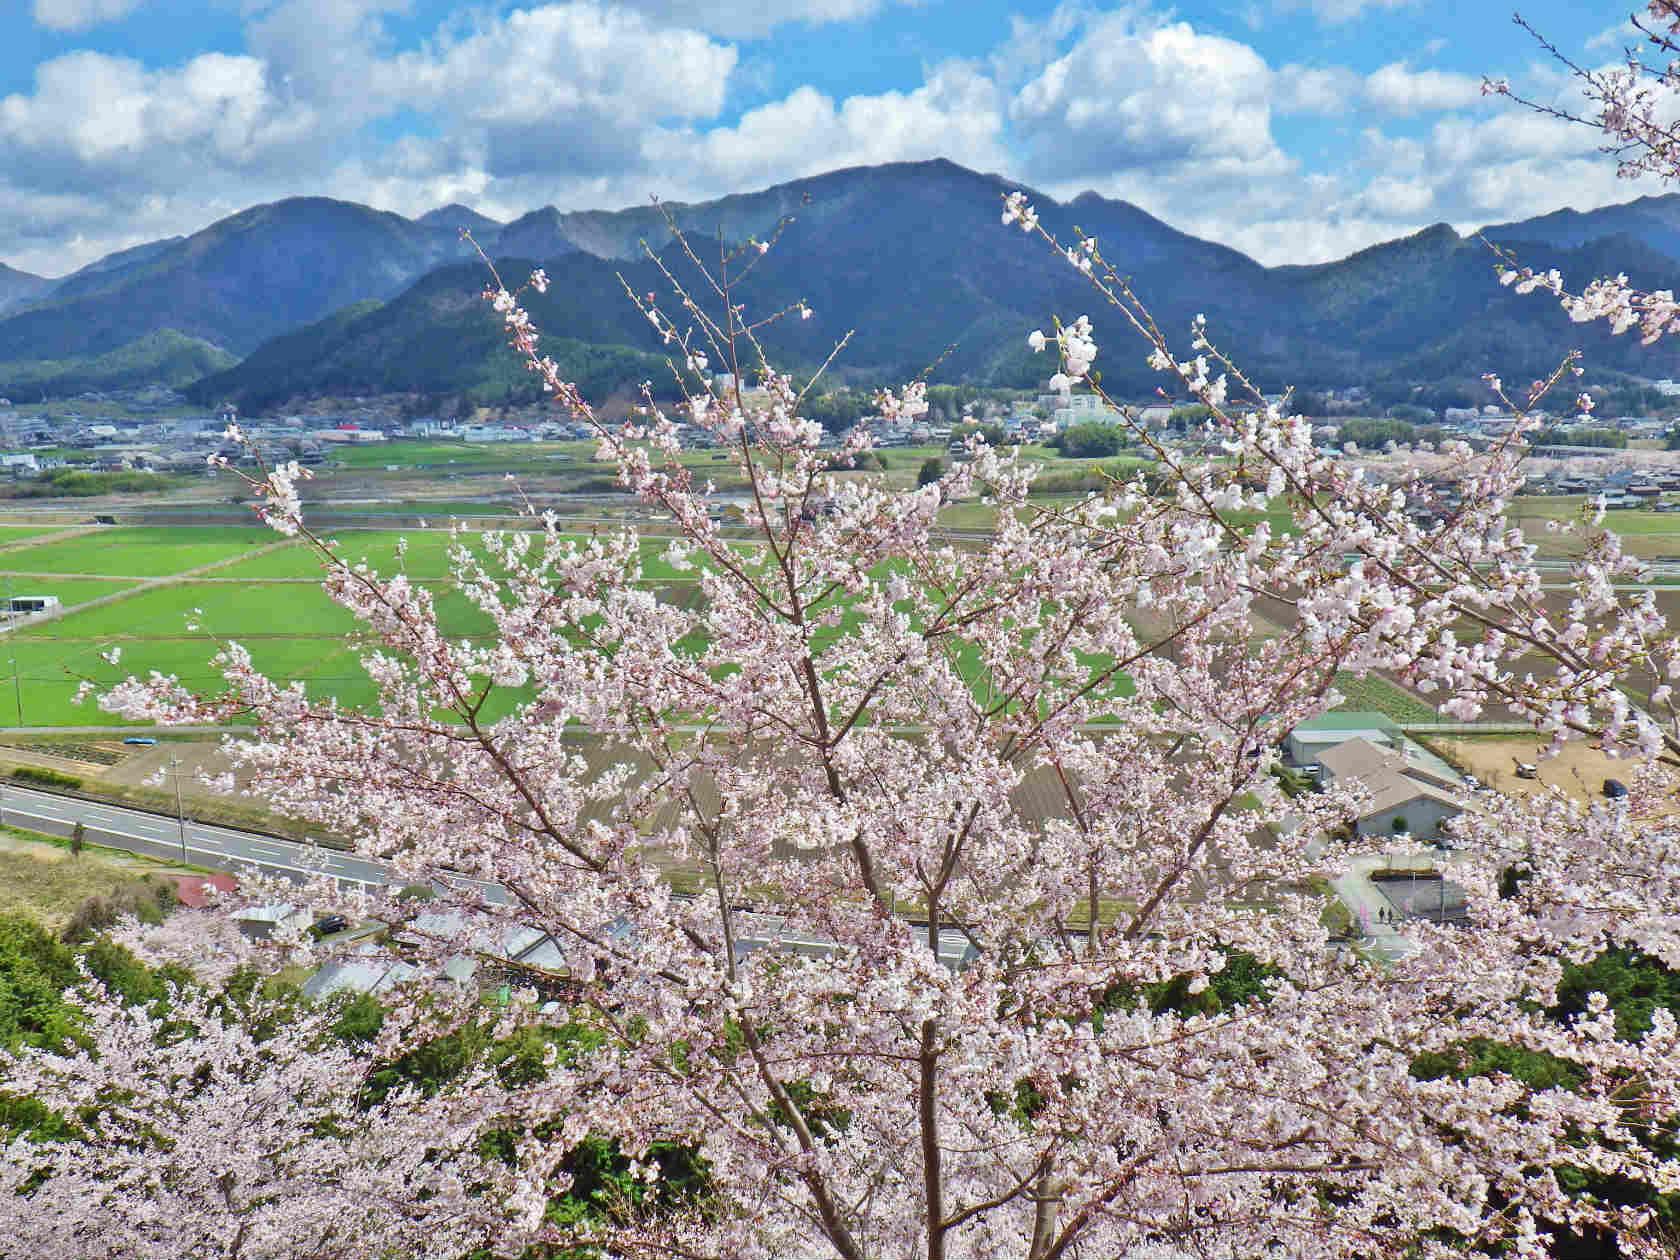 23a 桜の丘の上からの眺め